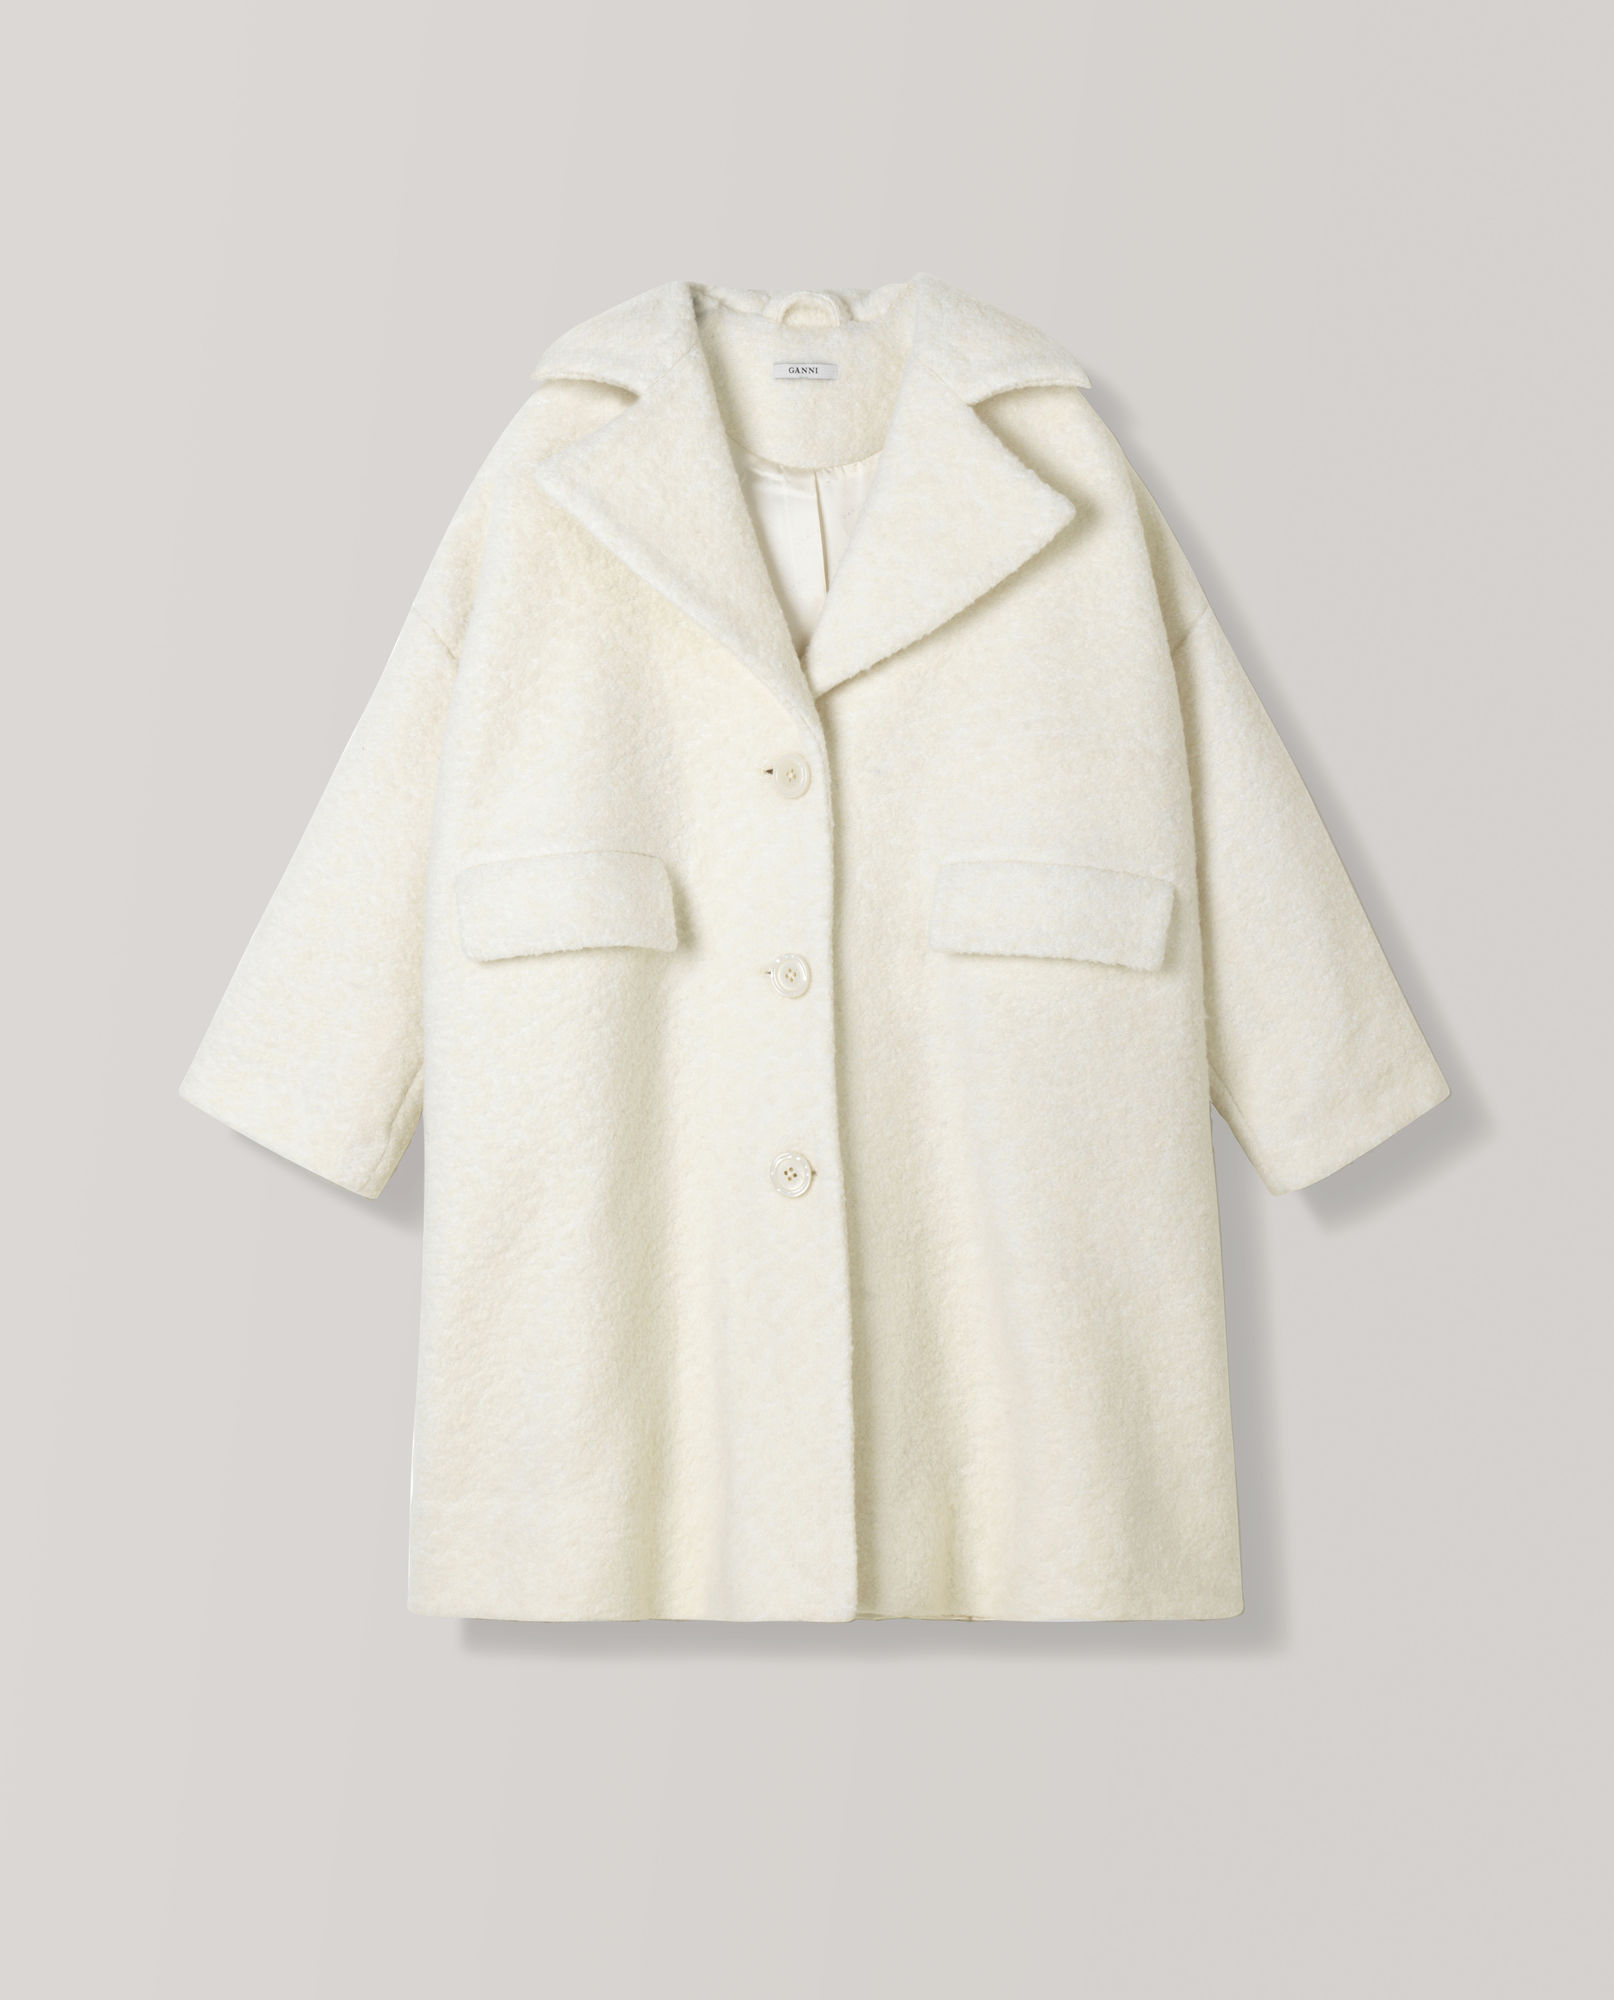 saldi online cappotti 2019